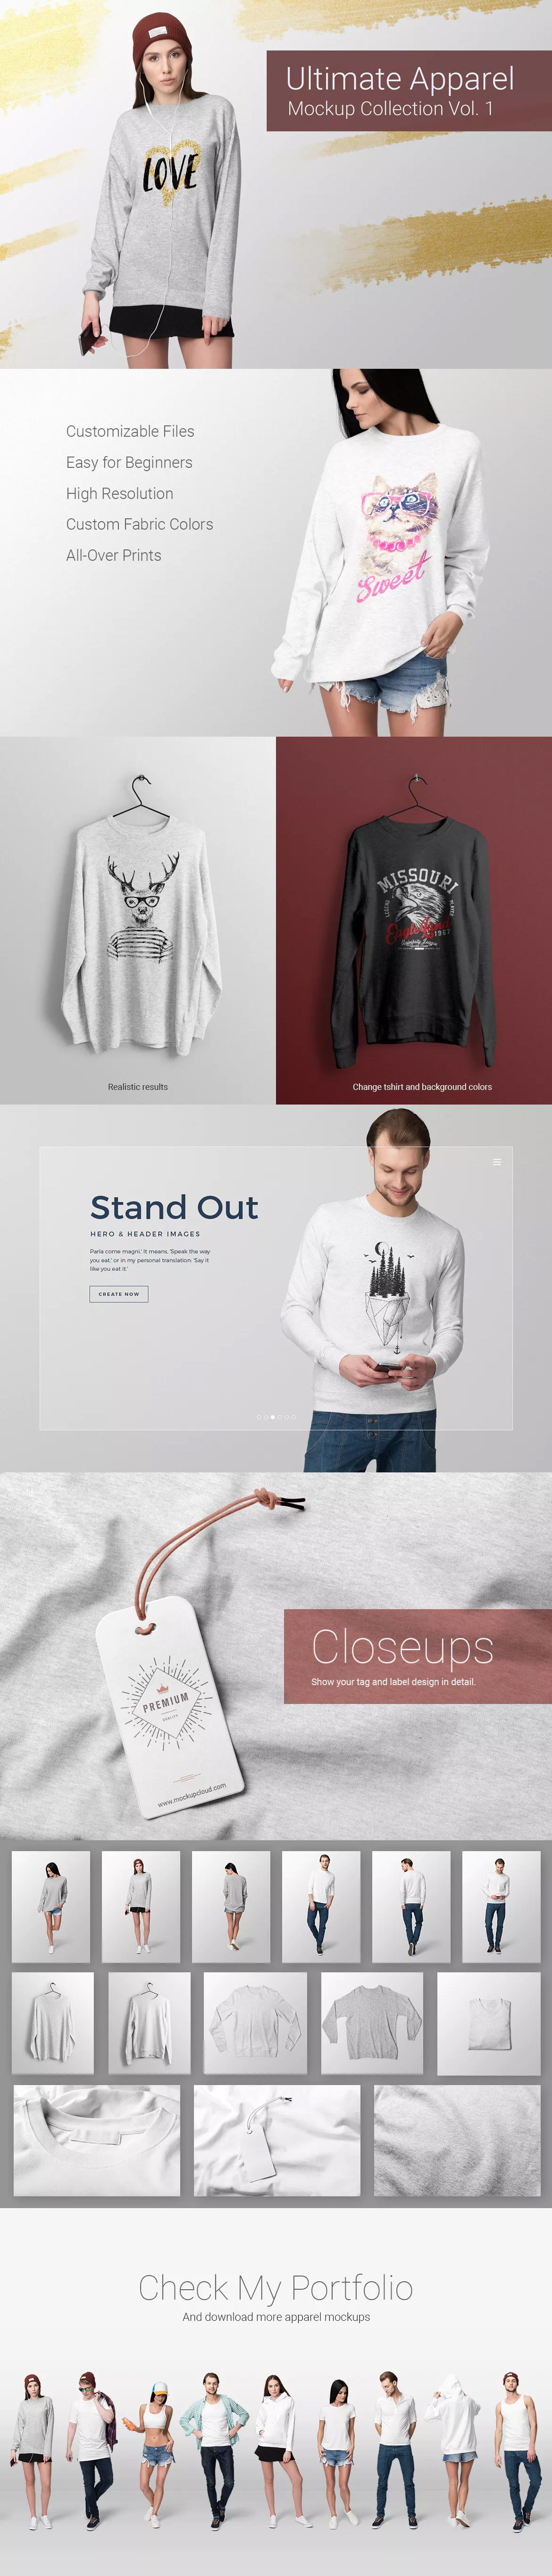 Download Ultimate Apparel Mockup Vol 7 By Genetic96 On Envato Elements Clothing Mockup Mockup Apparel